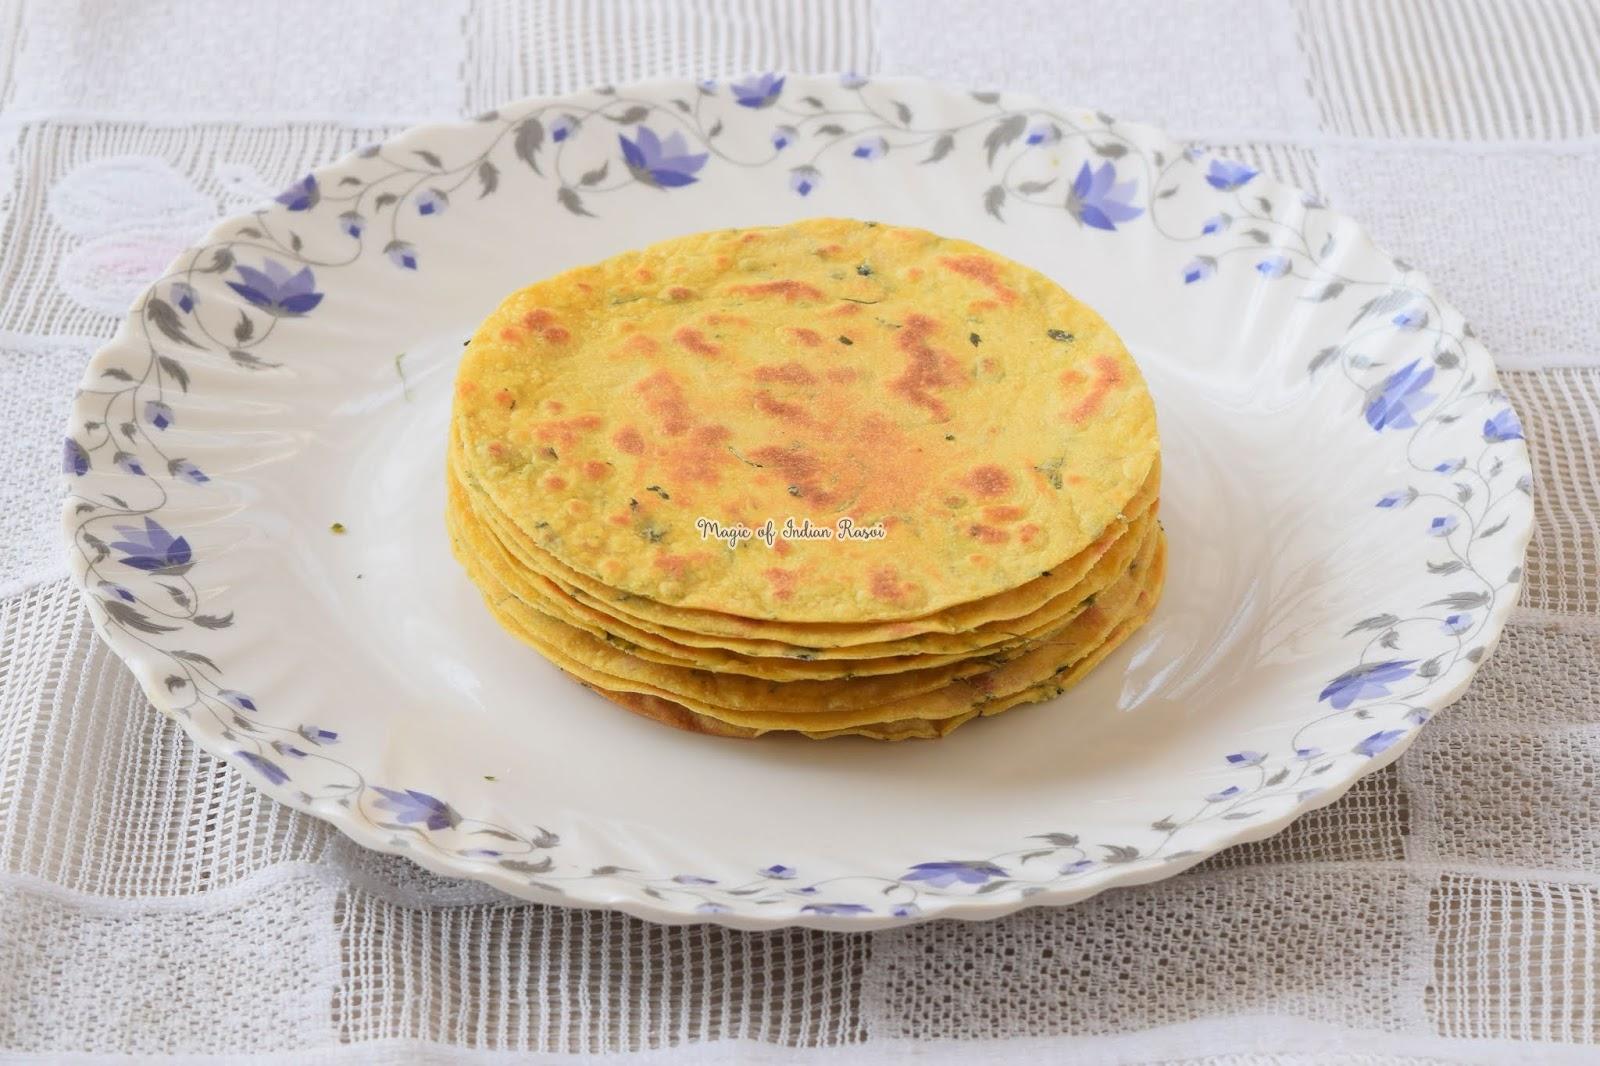 Gujarati Methi Khakhra Recipe - घर के बने क्रिस्पी मेथी खाखरा रेसिपी - Priya R - Magic of Indian Rasoi